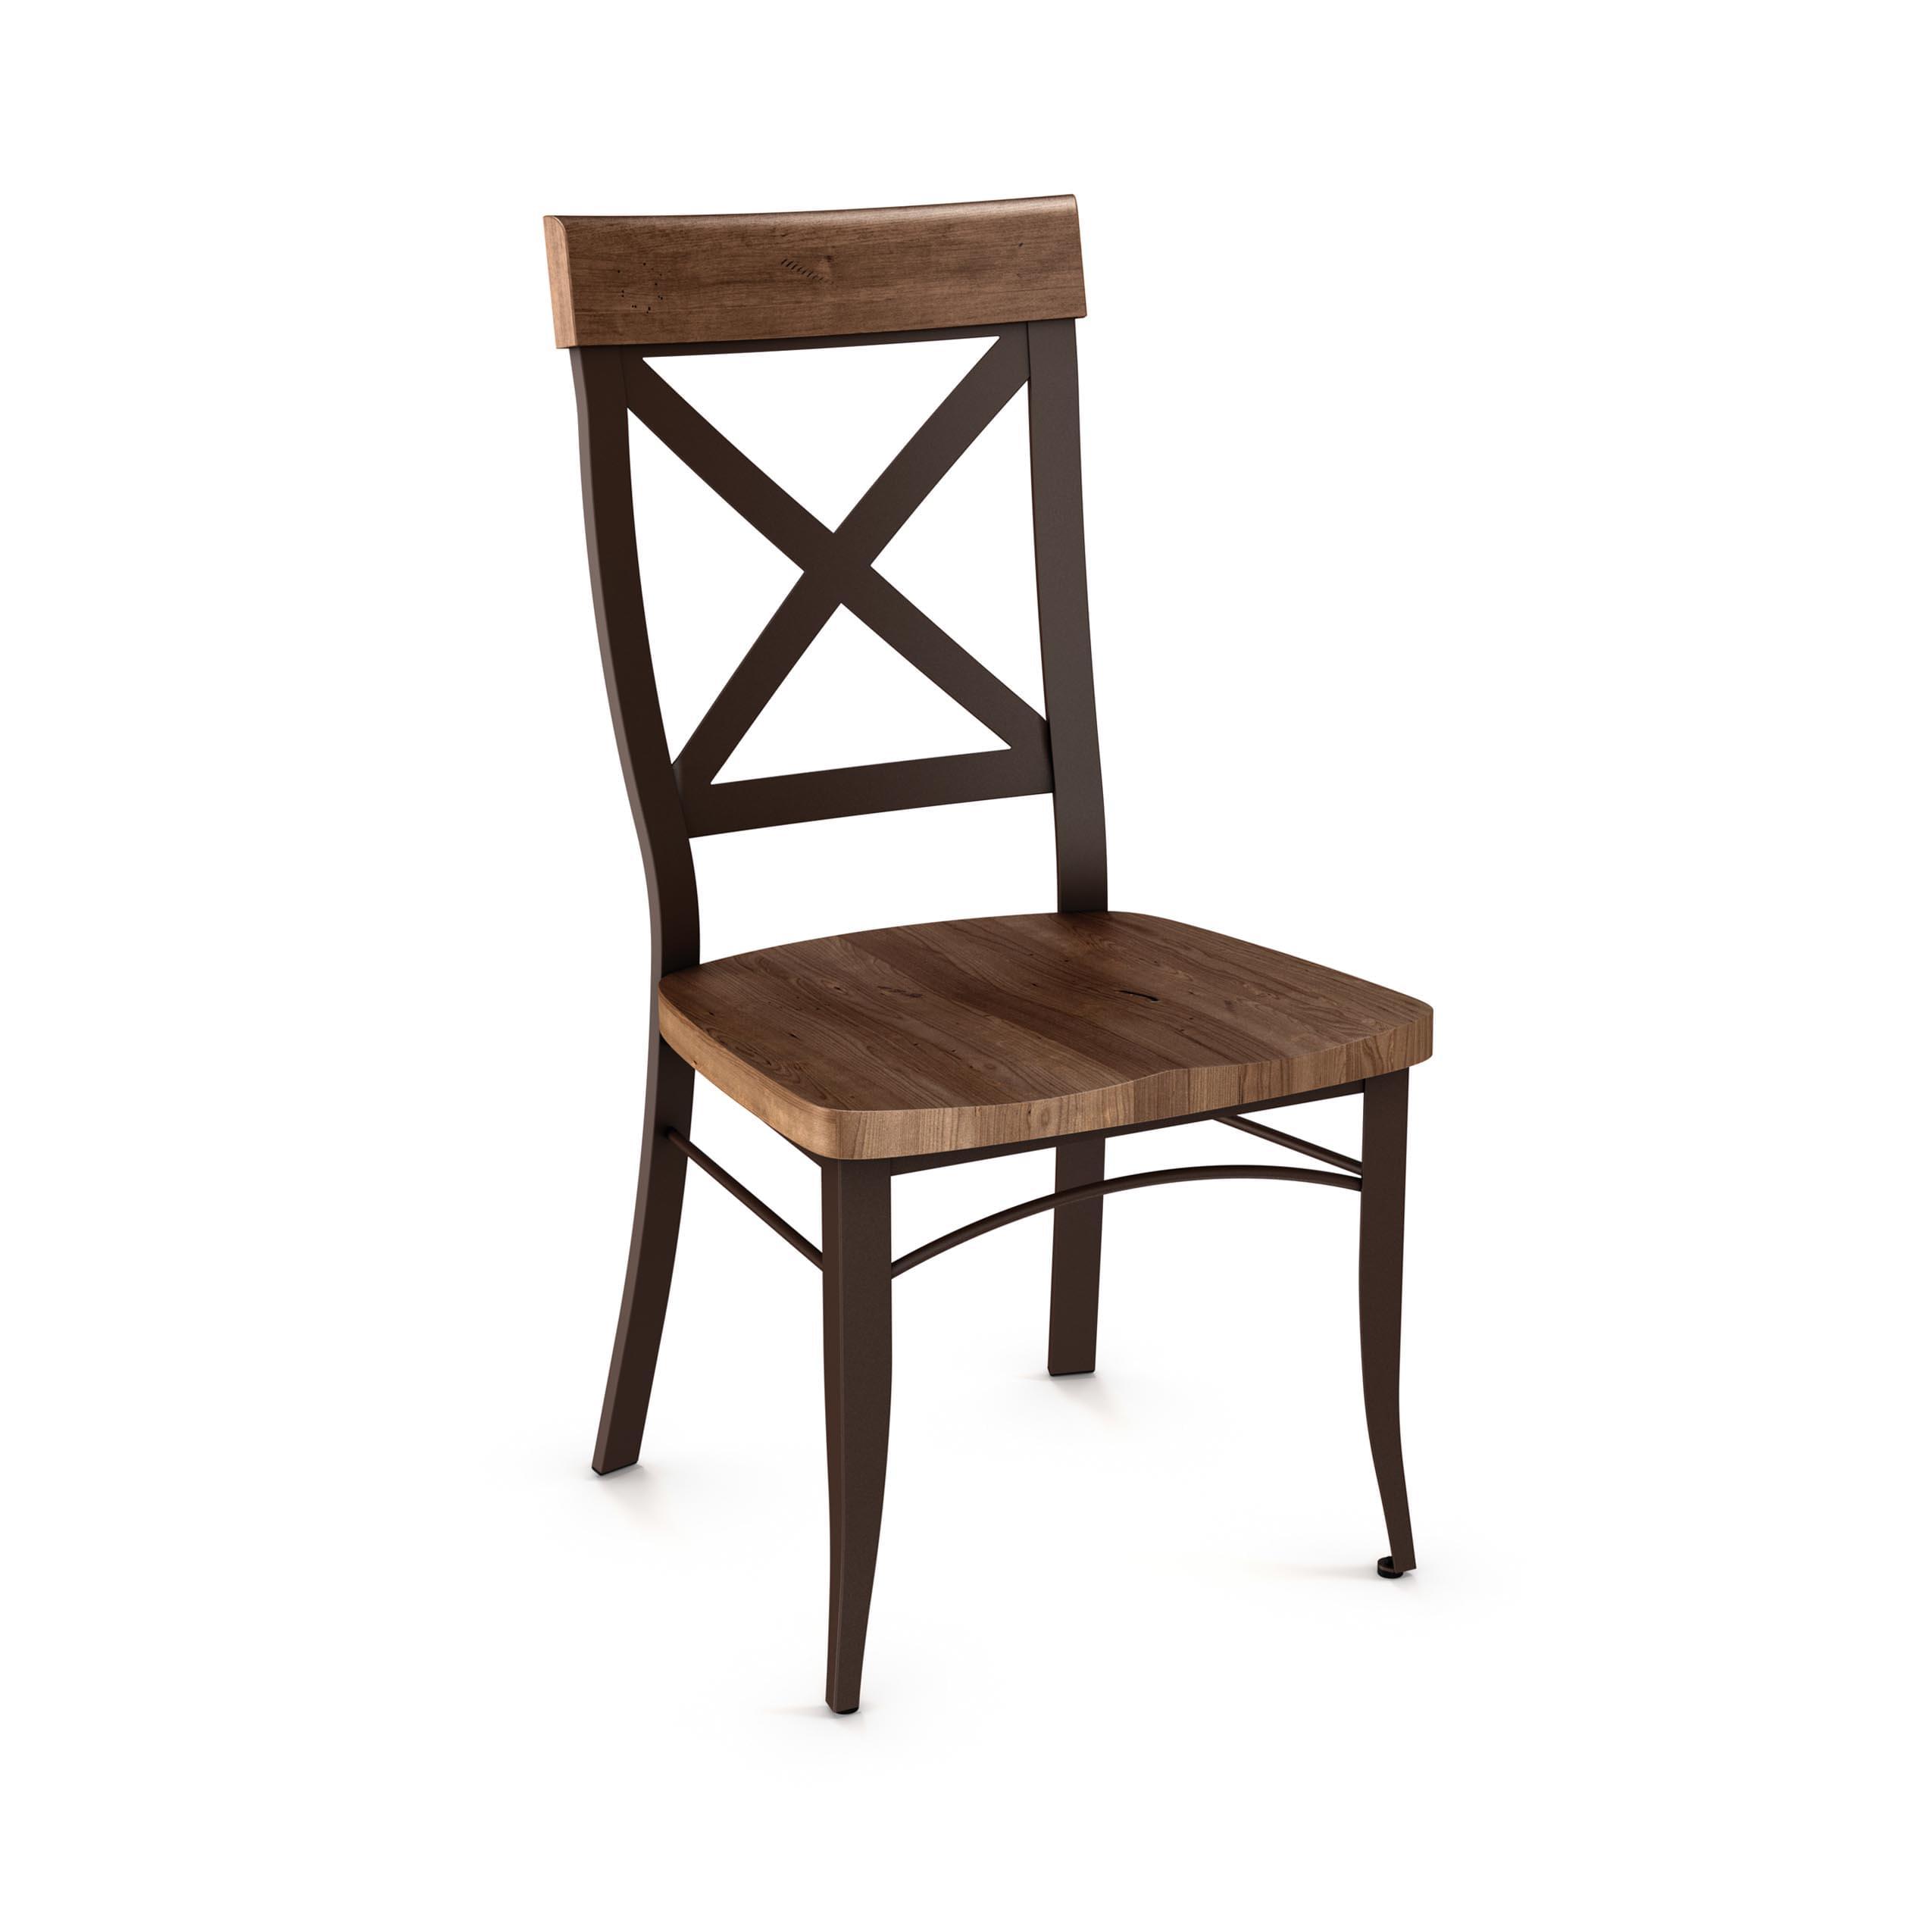 Amisco-Kyle-Mums-Furniture-Store-Home-Interior-Design-Kitchen